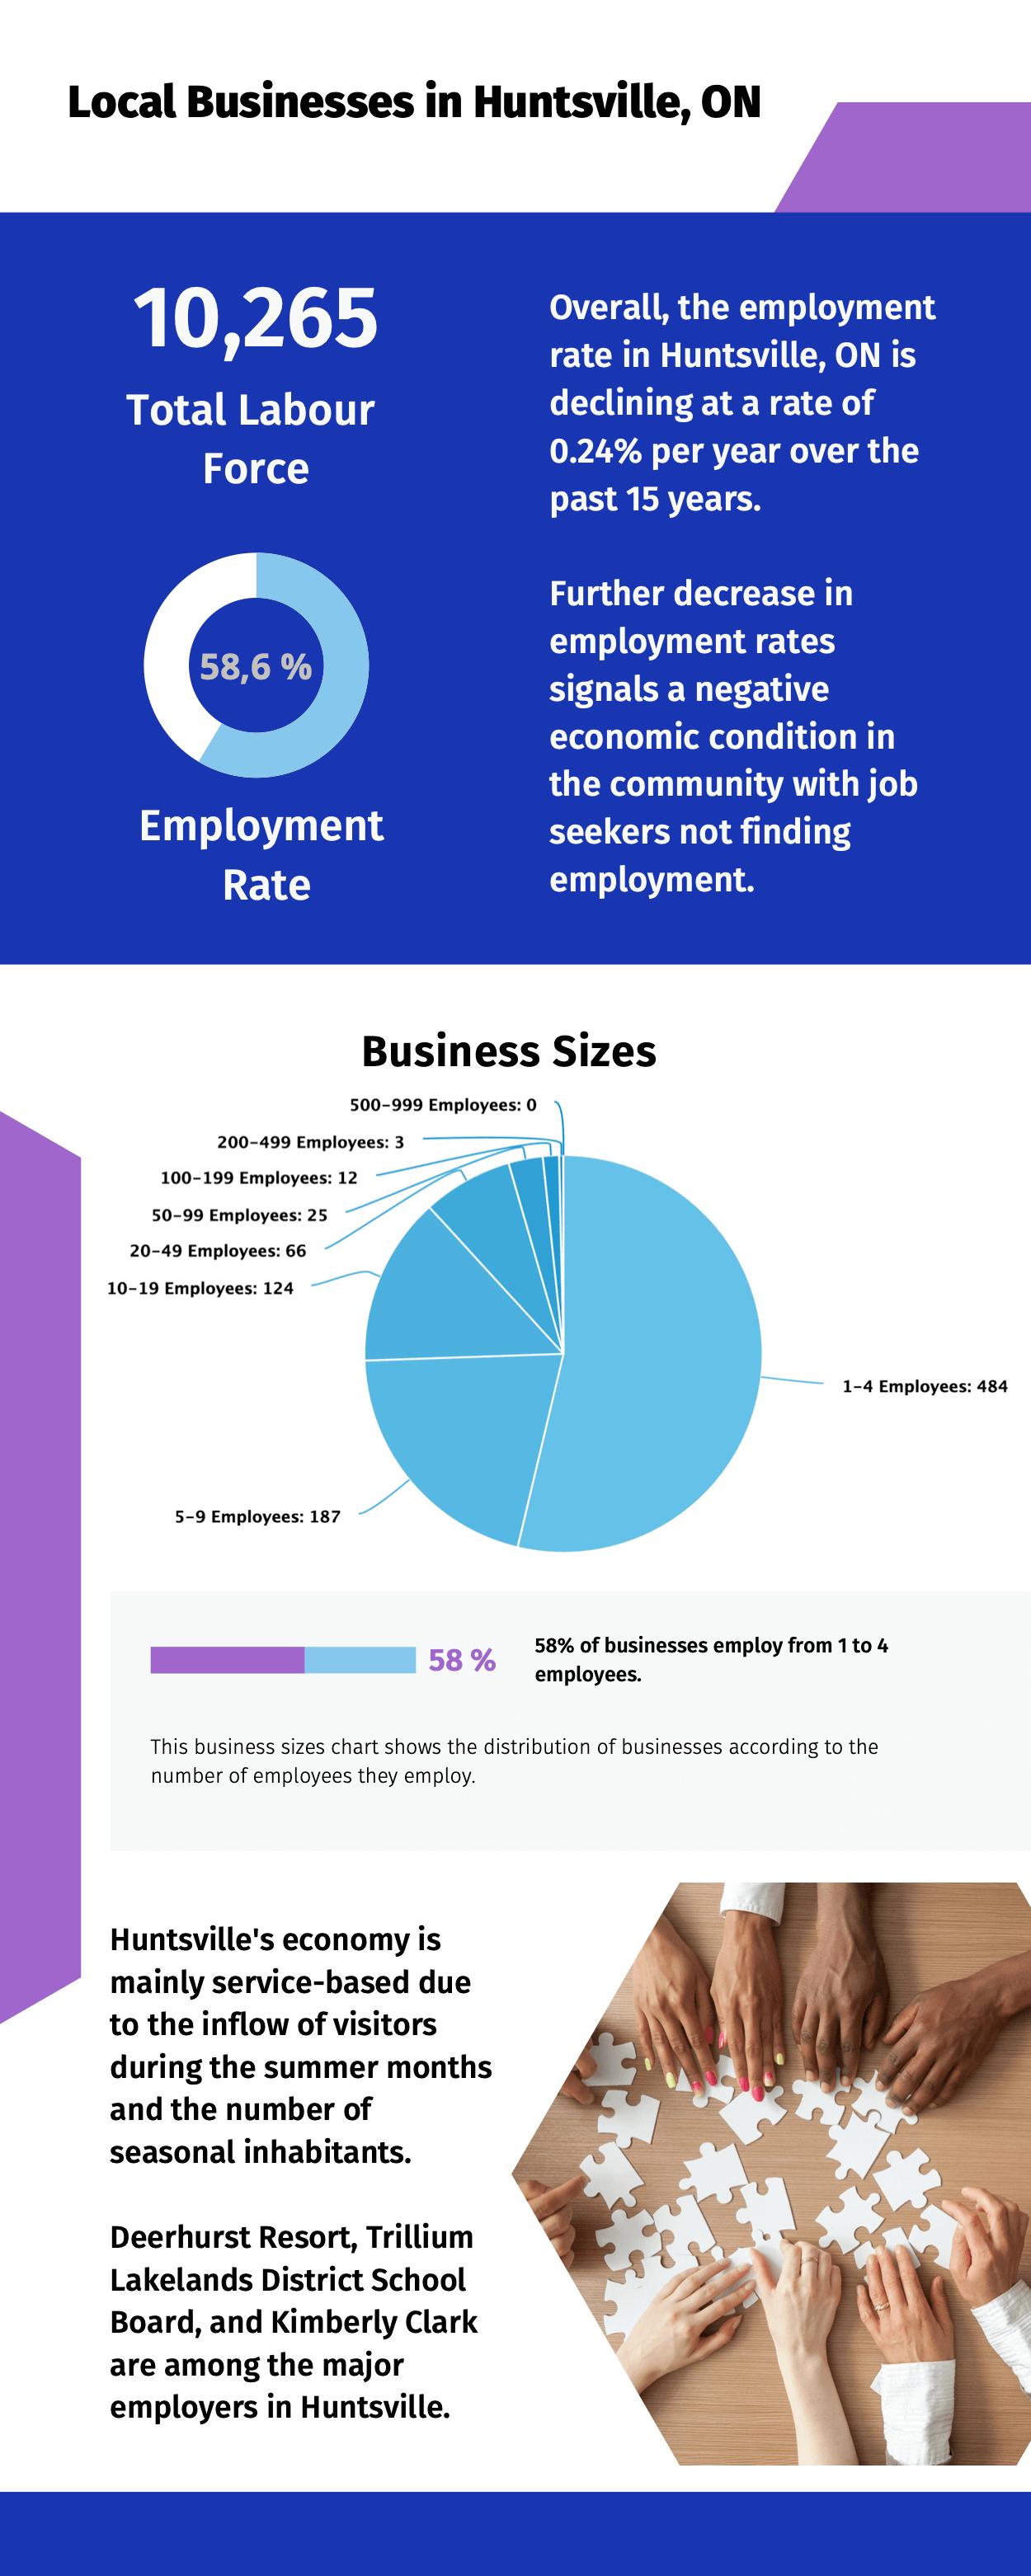 Local Businesses in Huntsville, ON